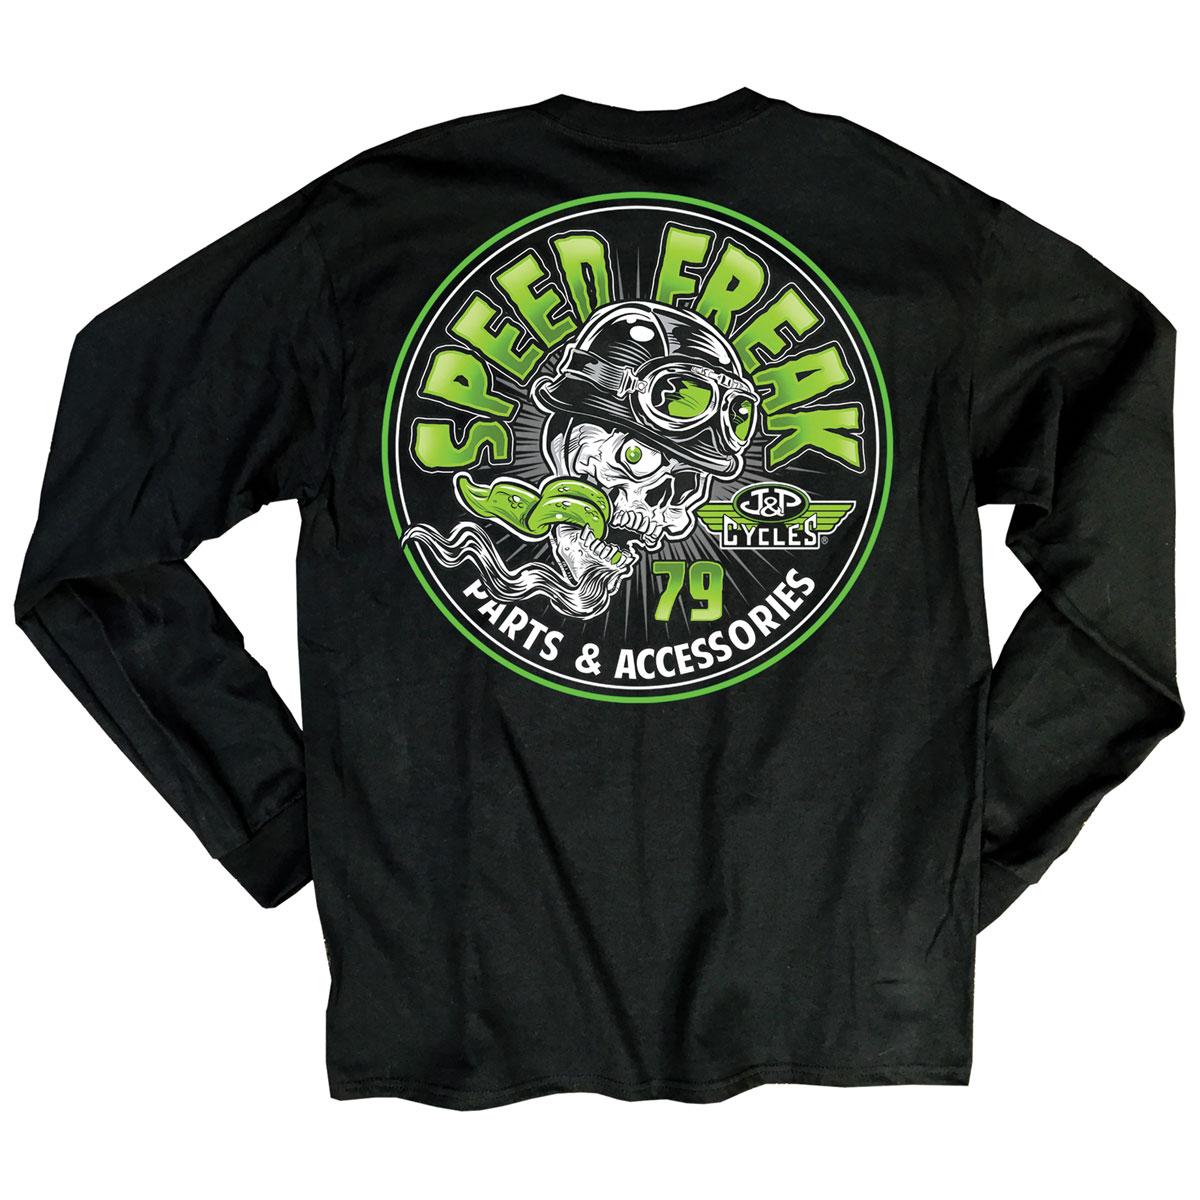 J&P Cycles Men's Speed Freak Black Long-Sleeve T-Shirt